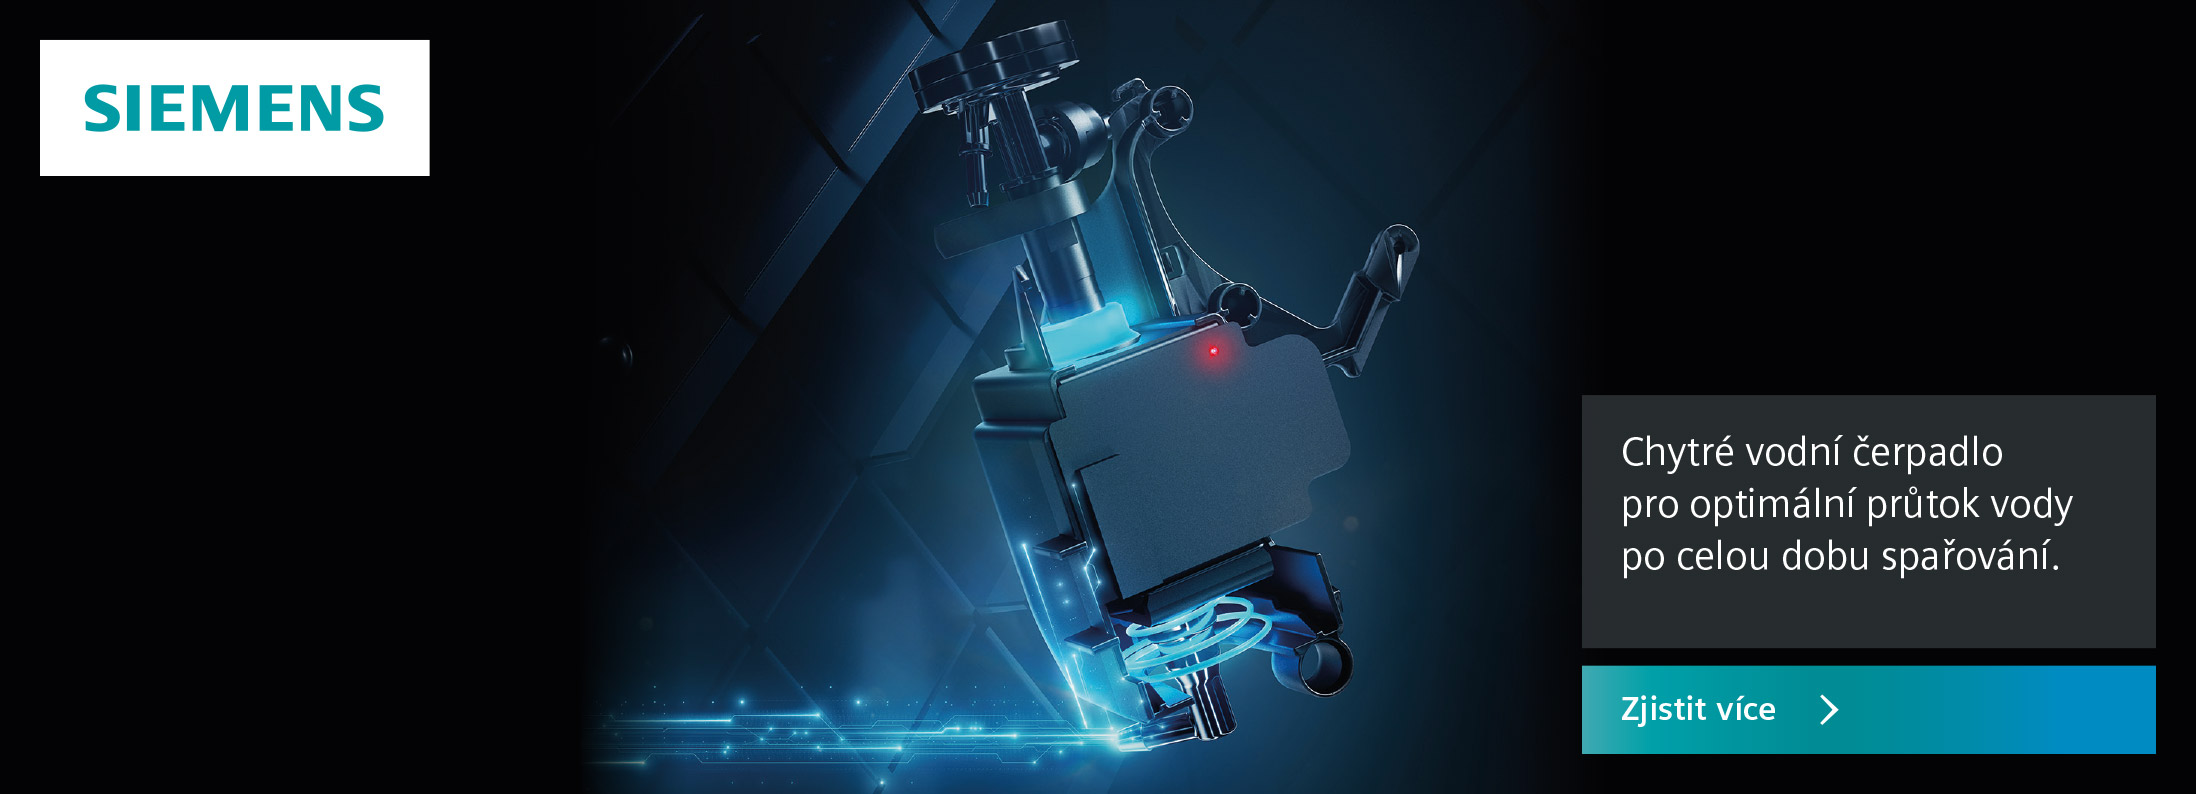 Siemens - Chytrá pumpa